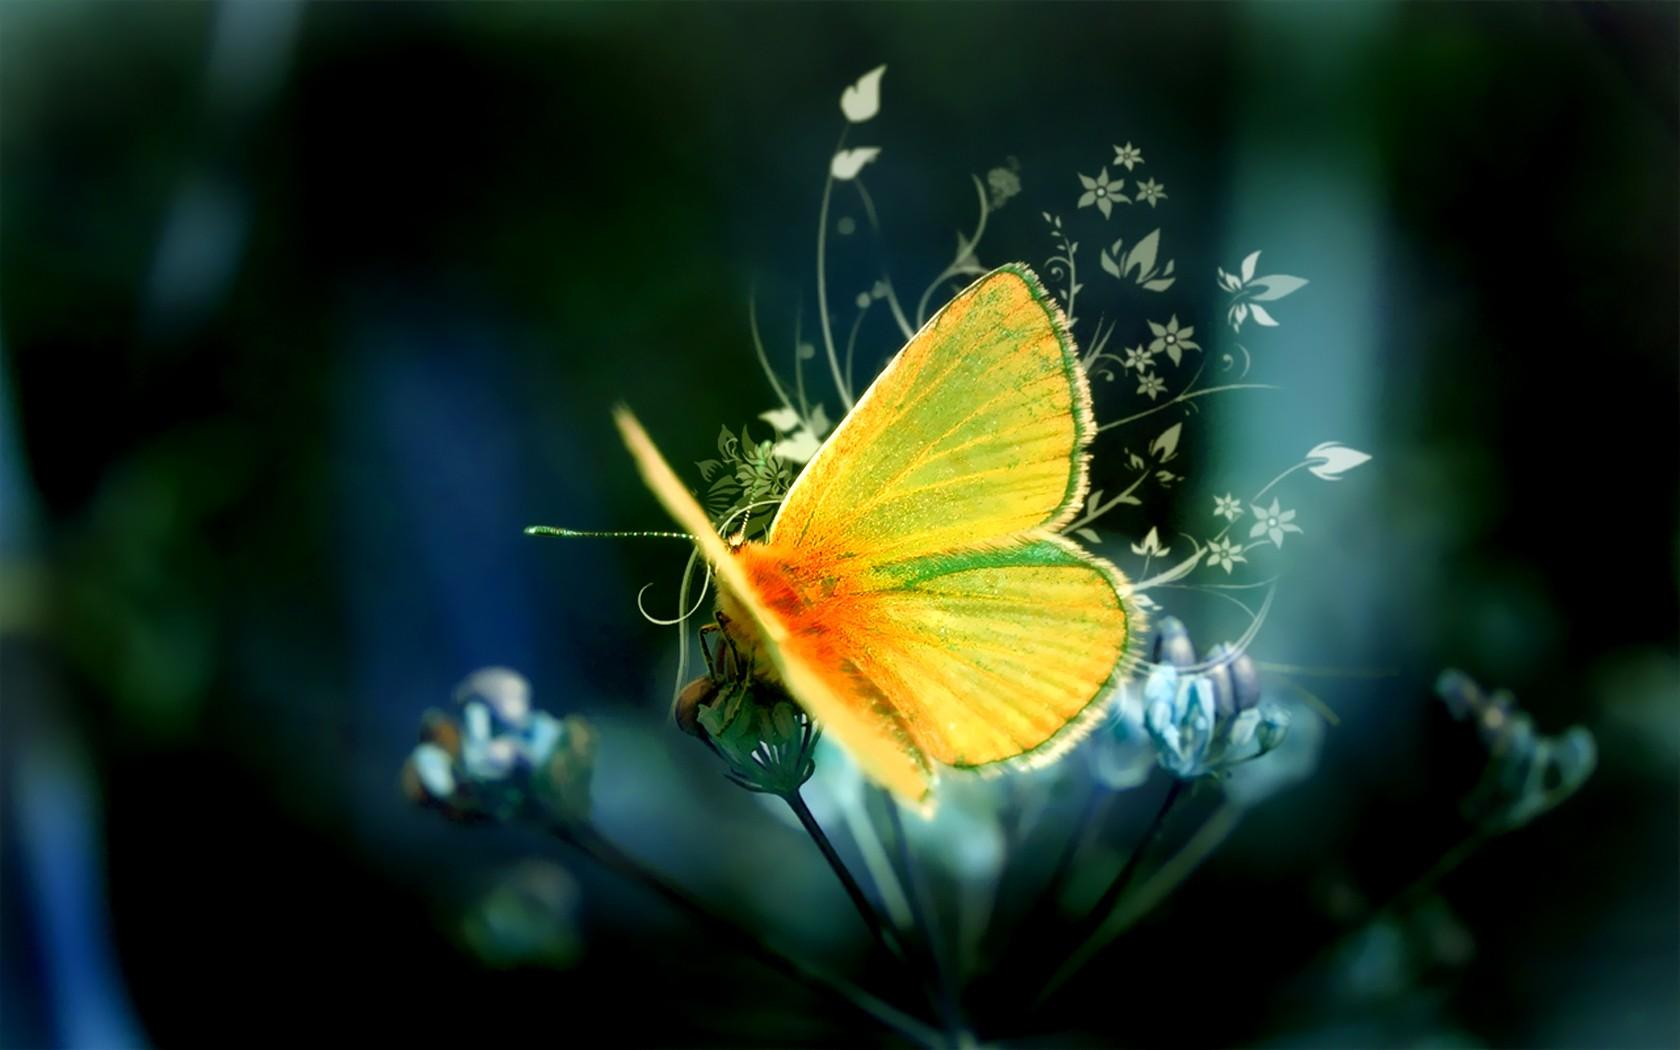 1680x1050px Butterfly Hd Wallpaper Com | #394310